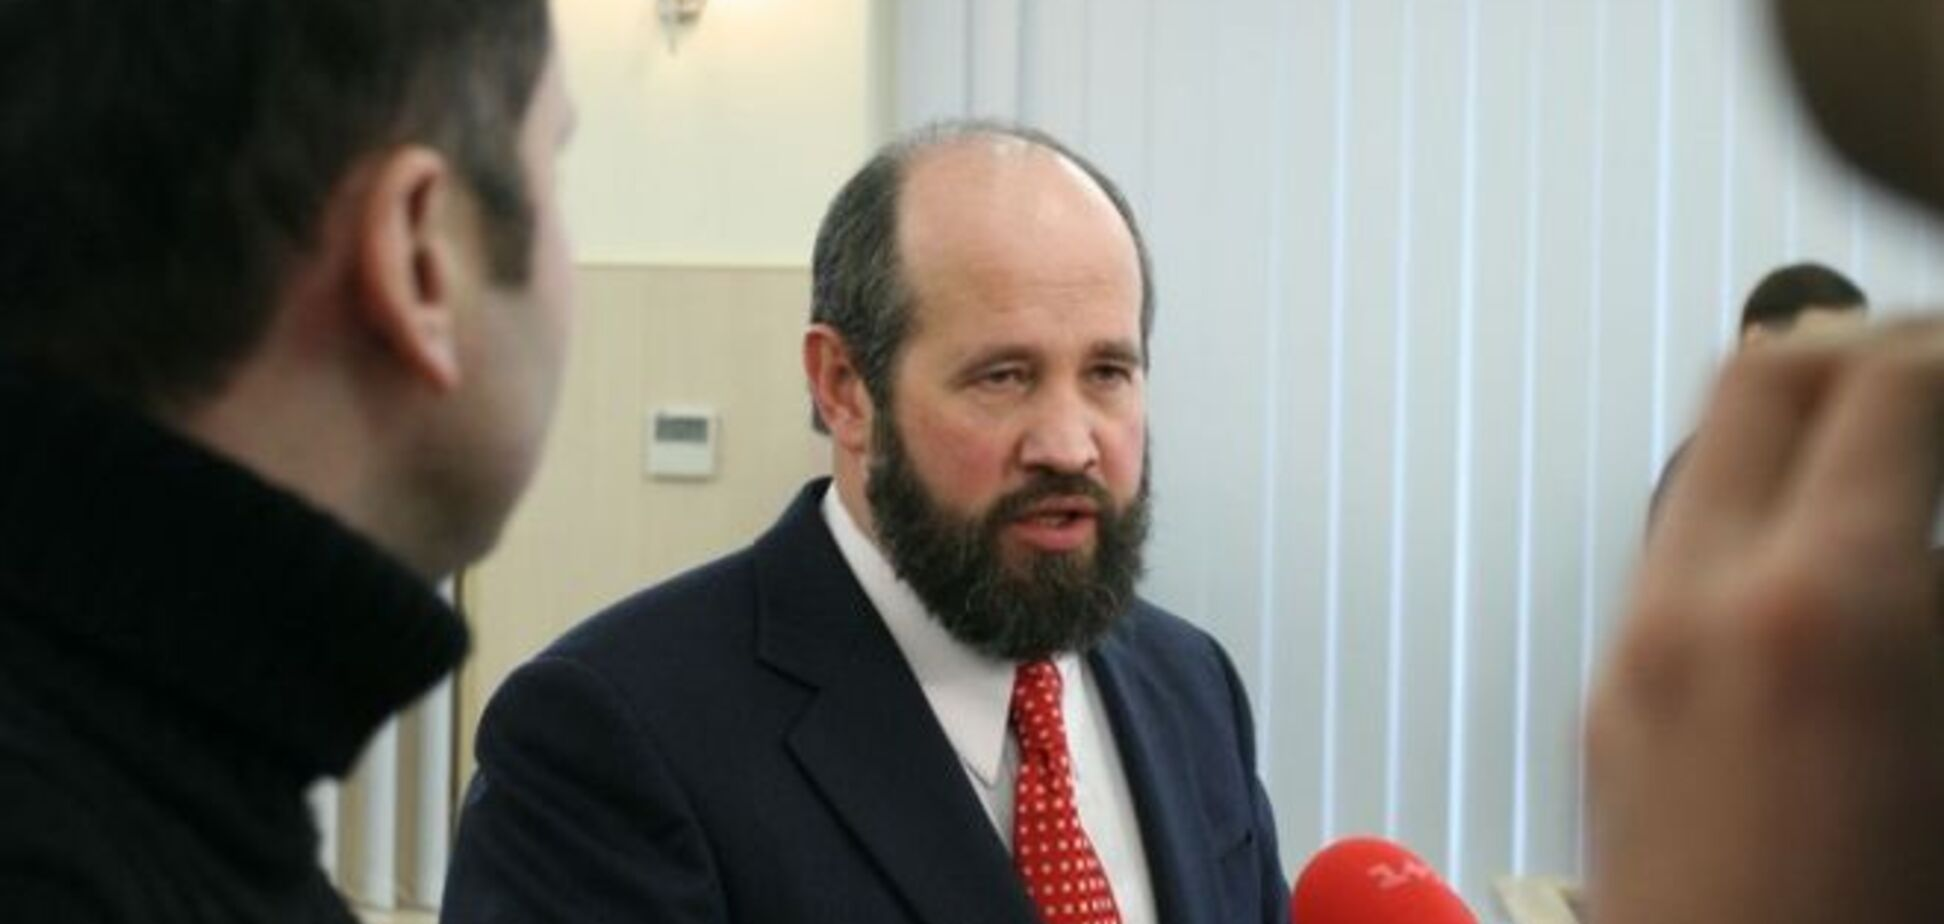 Проти адвоката Рената Кузьміна завели кримінальну справу